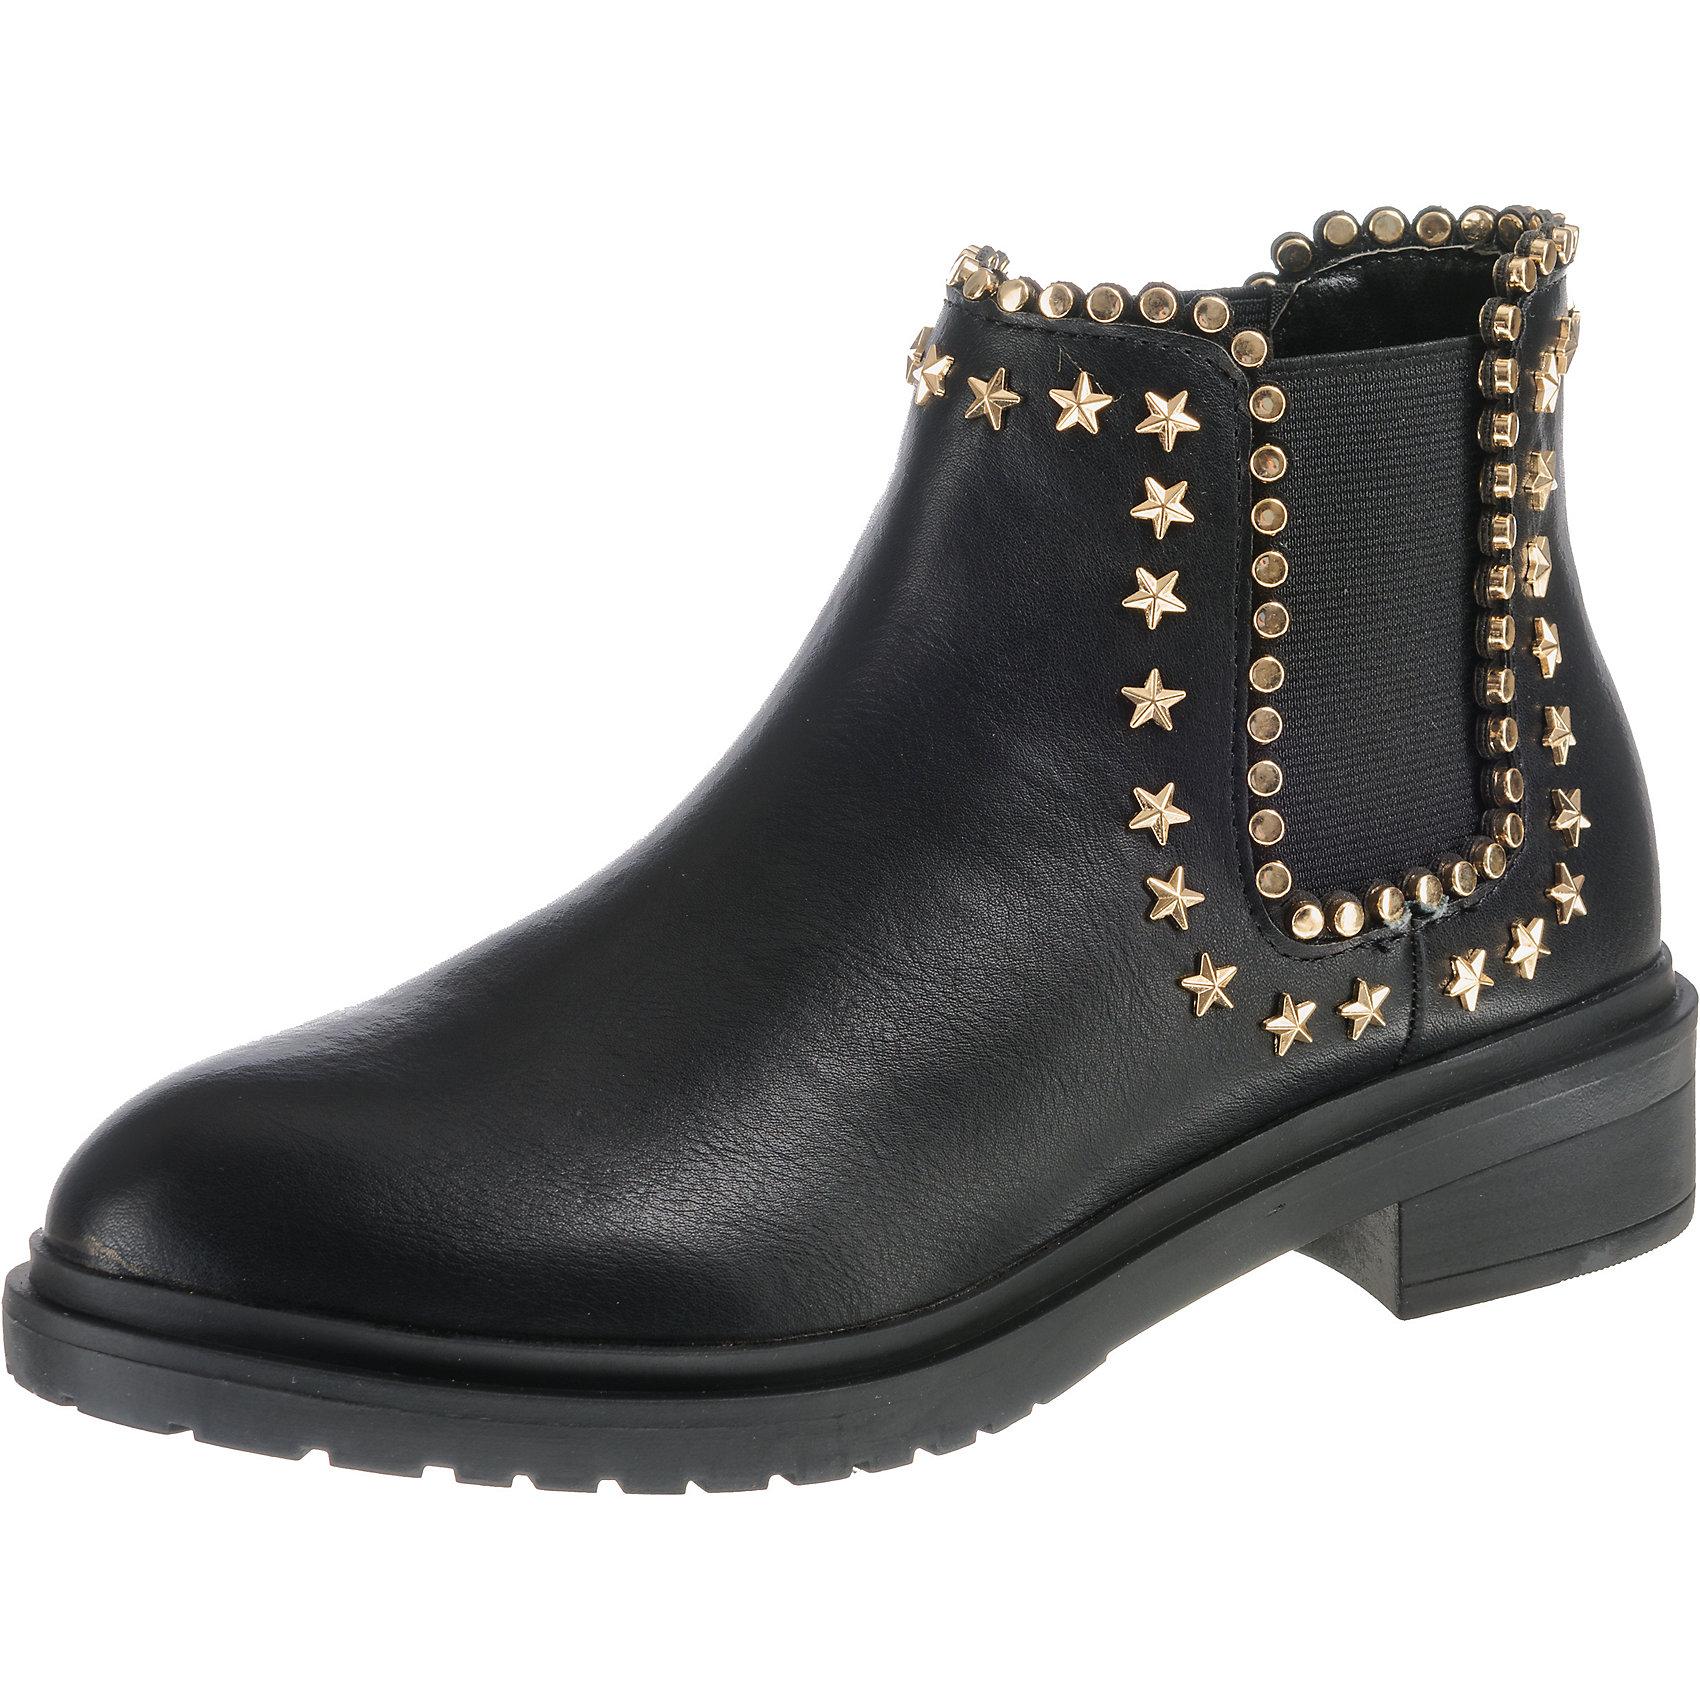 Neu schwarz BUFFALO Chelsea Stiefel 8761283 für Damen schwarz Neu 9ed597